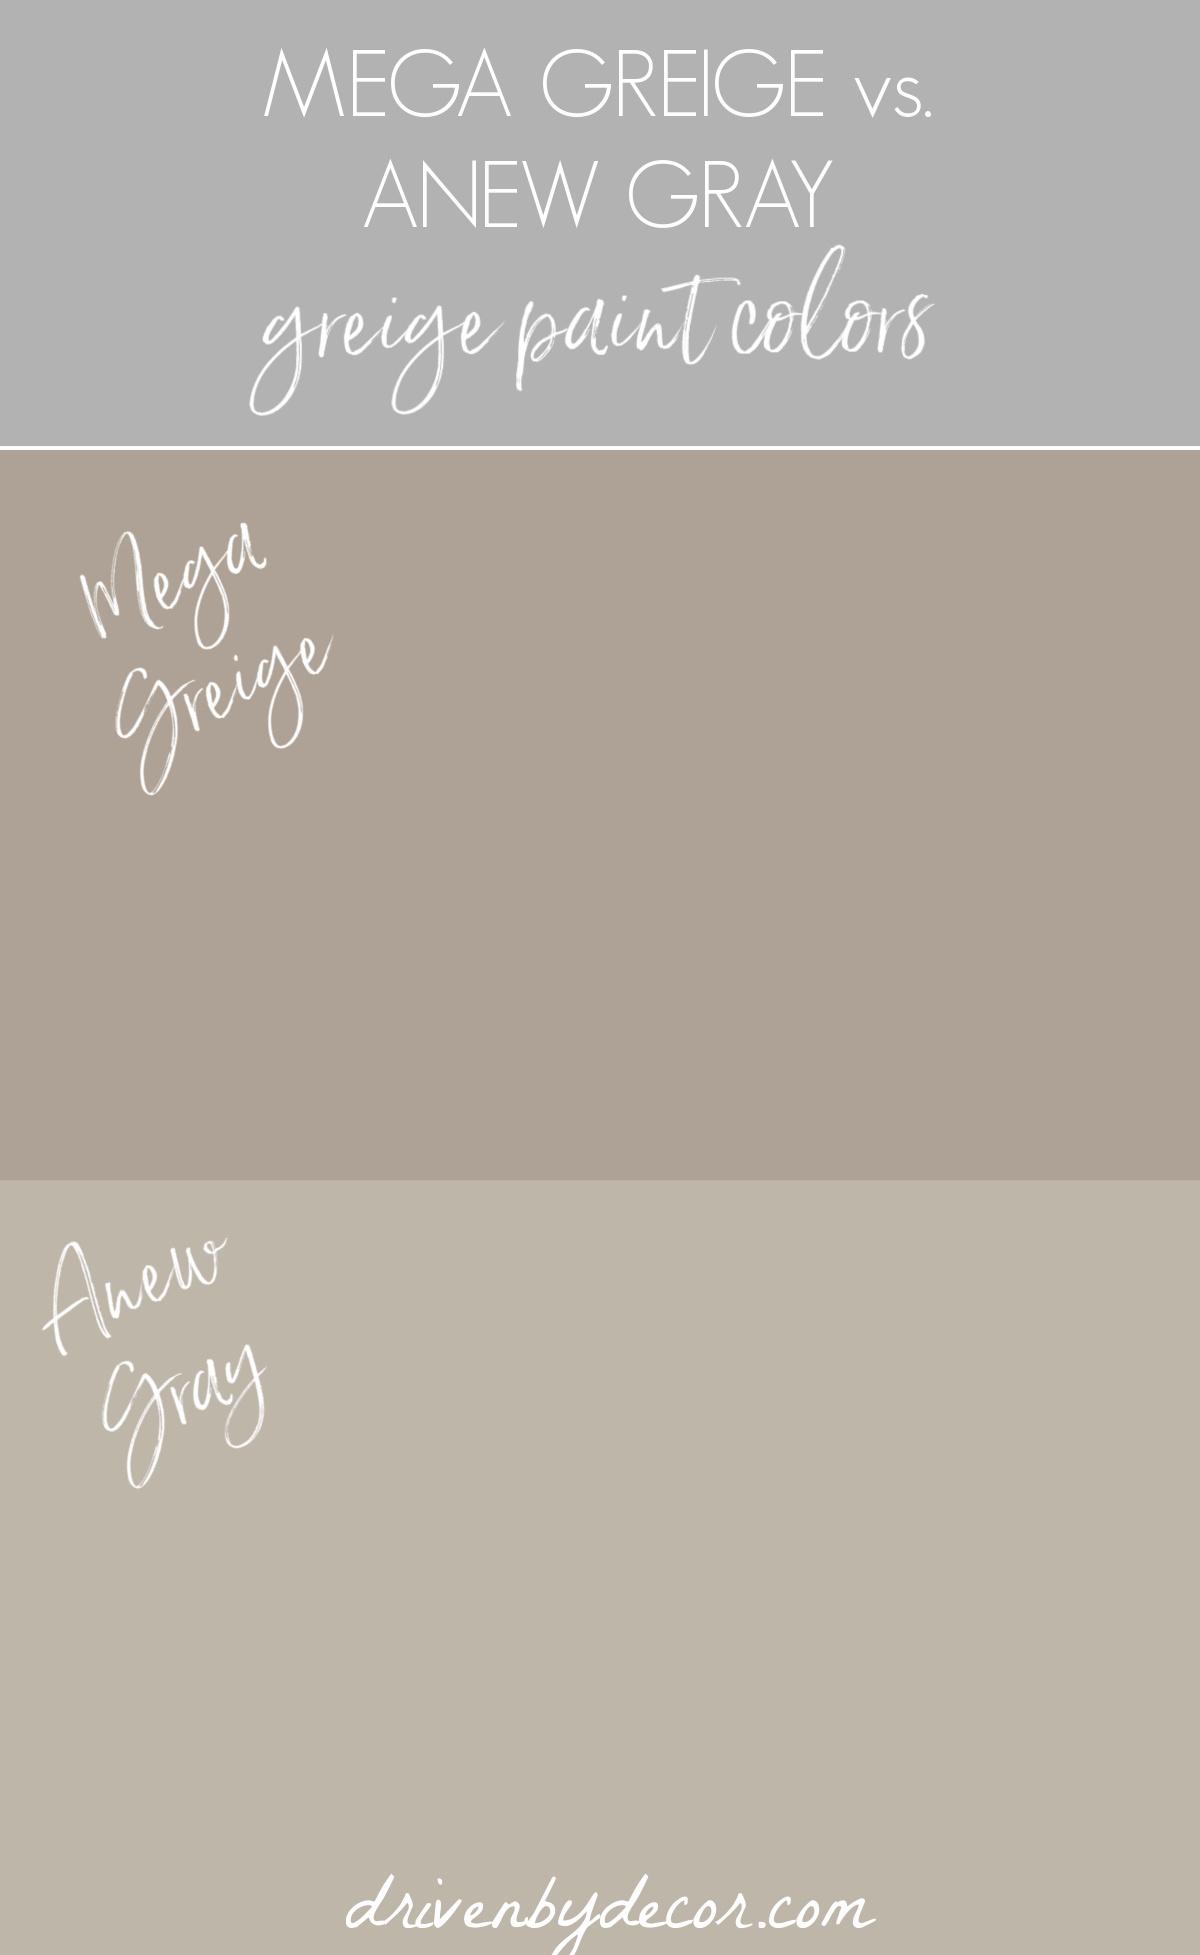 Mega Greige vs. Anew Gray greige paint colors